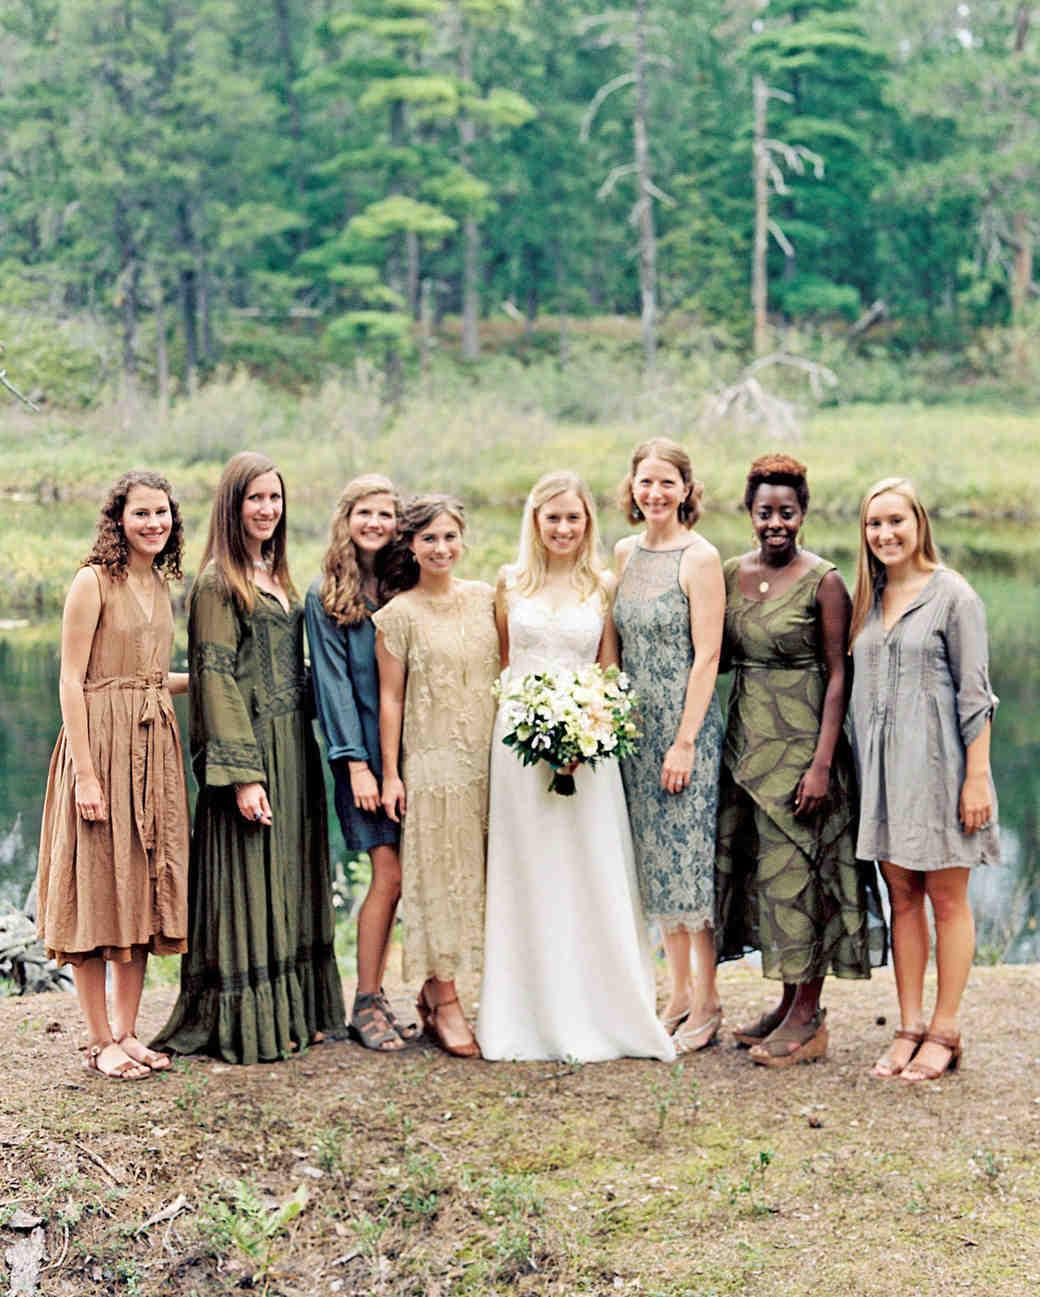 adele seth wedding michigan bridesmaids